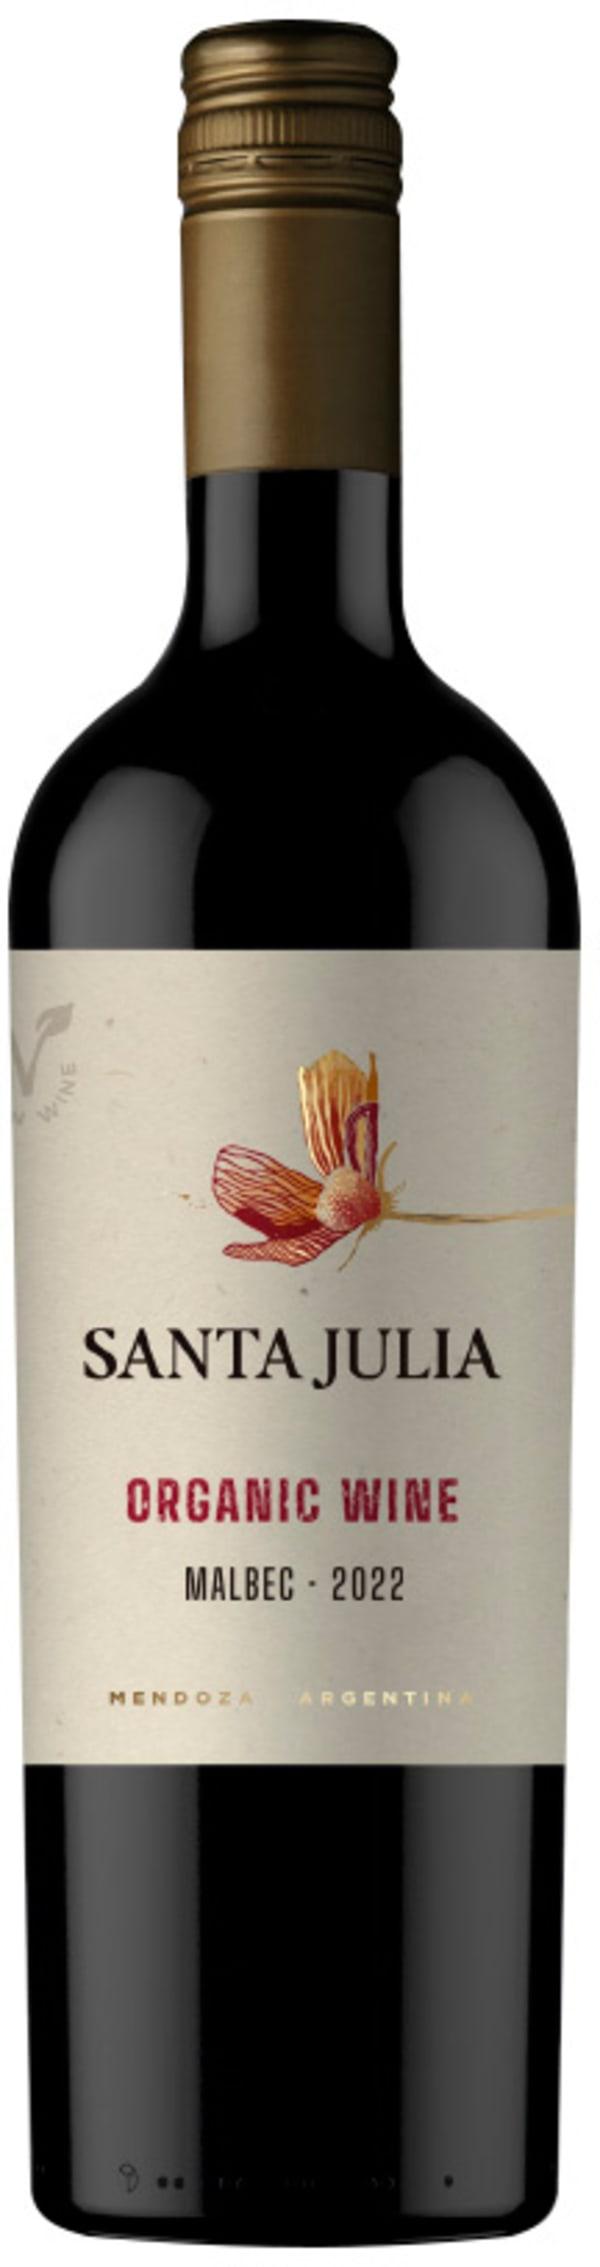 Santa Julia Organic Malbec 2019